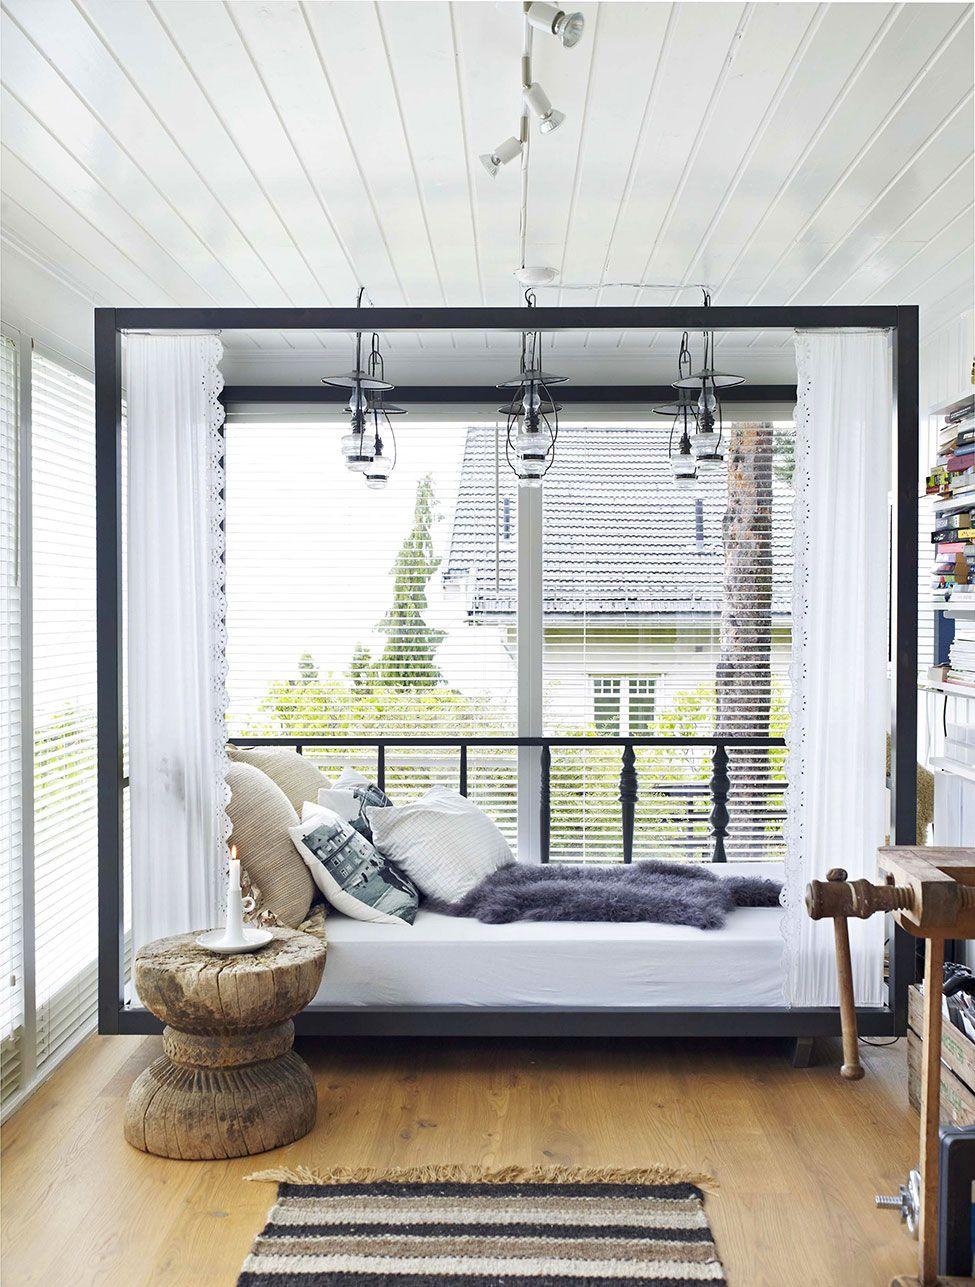 Scandinavian Design Home Of An Interior Designer In Oslo By Steen